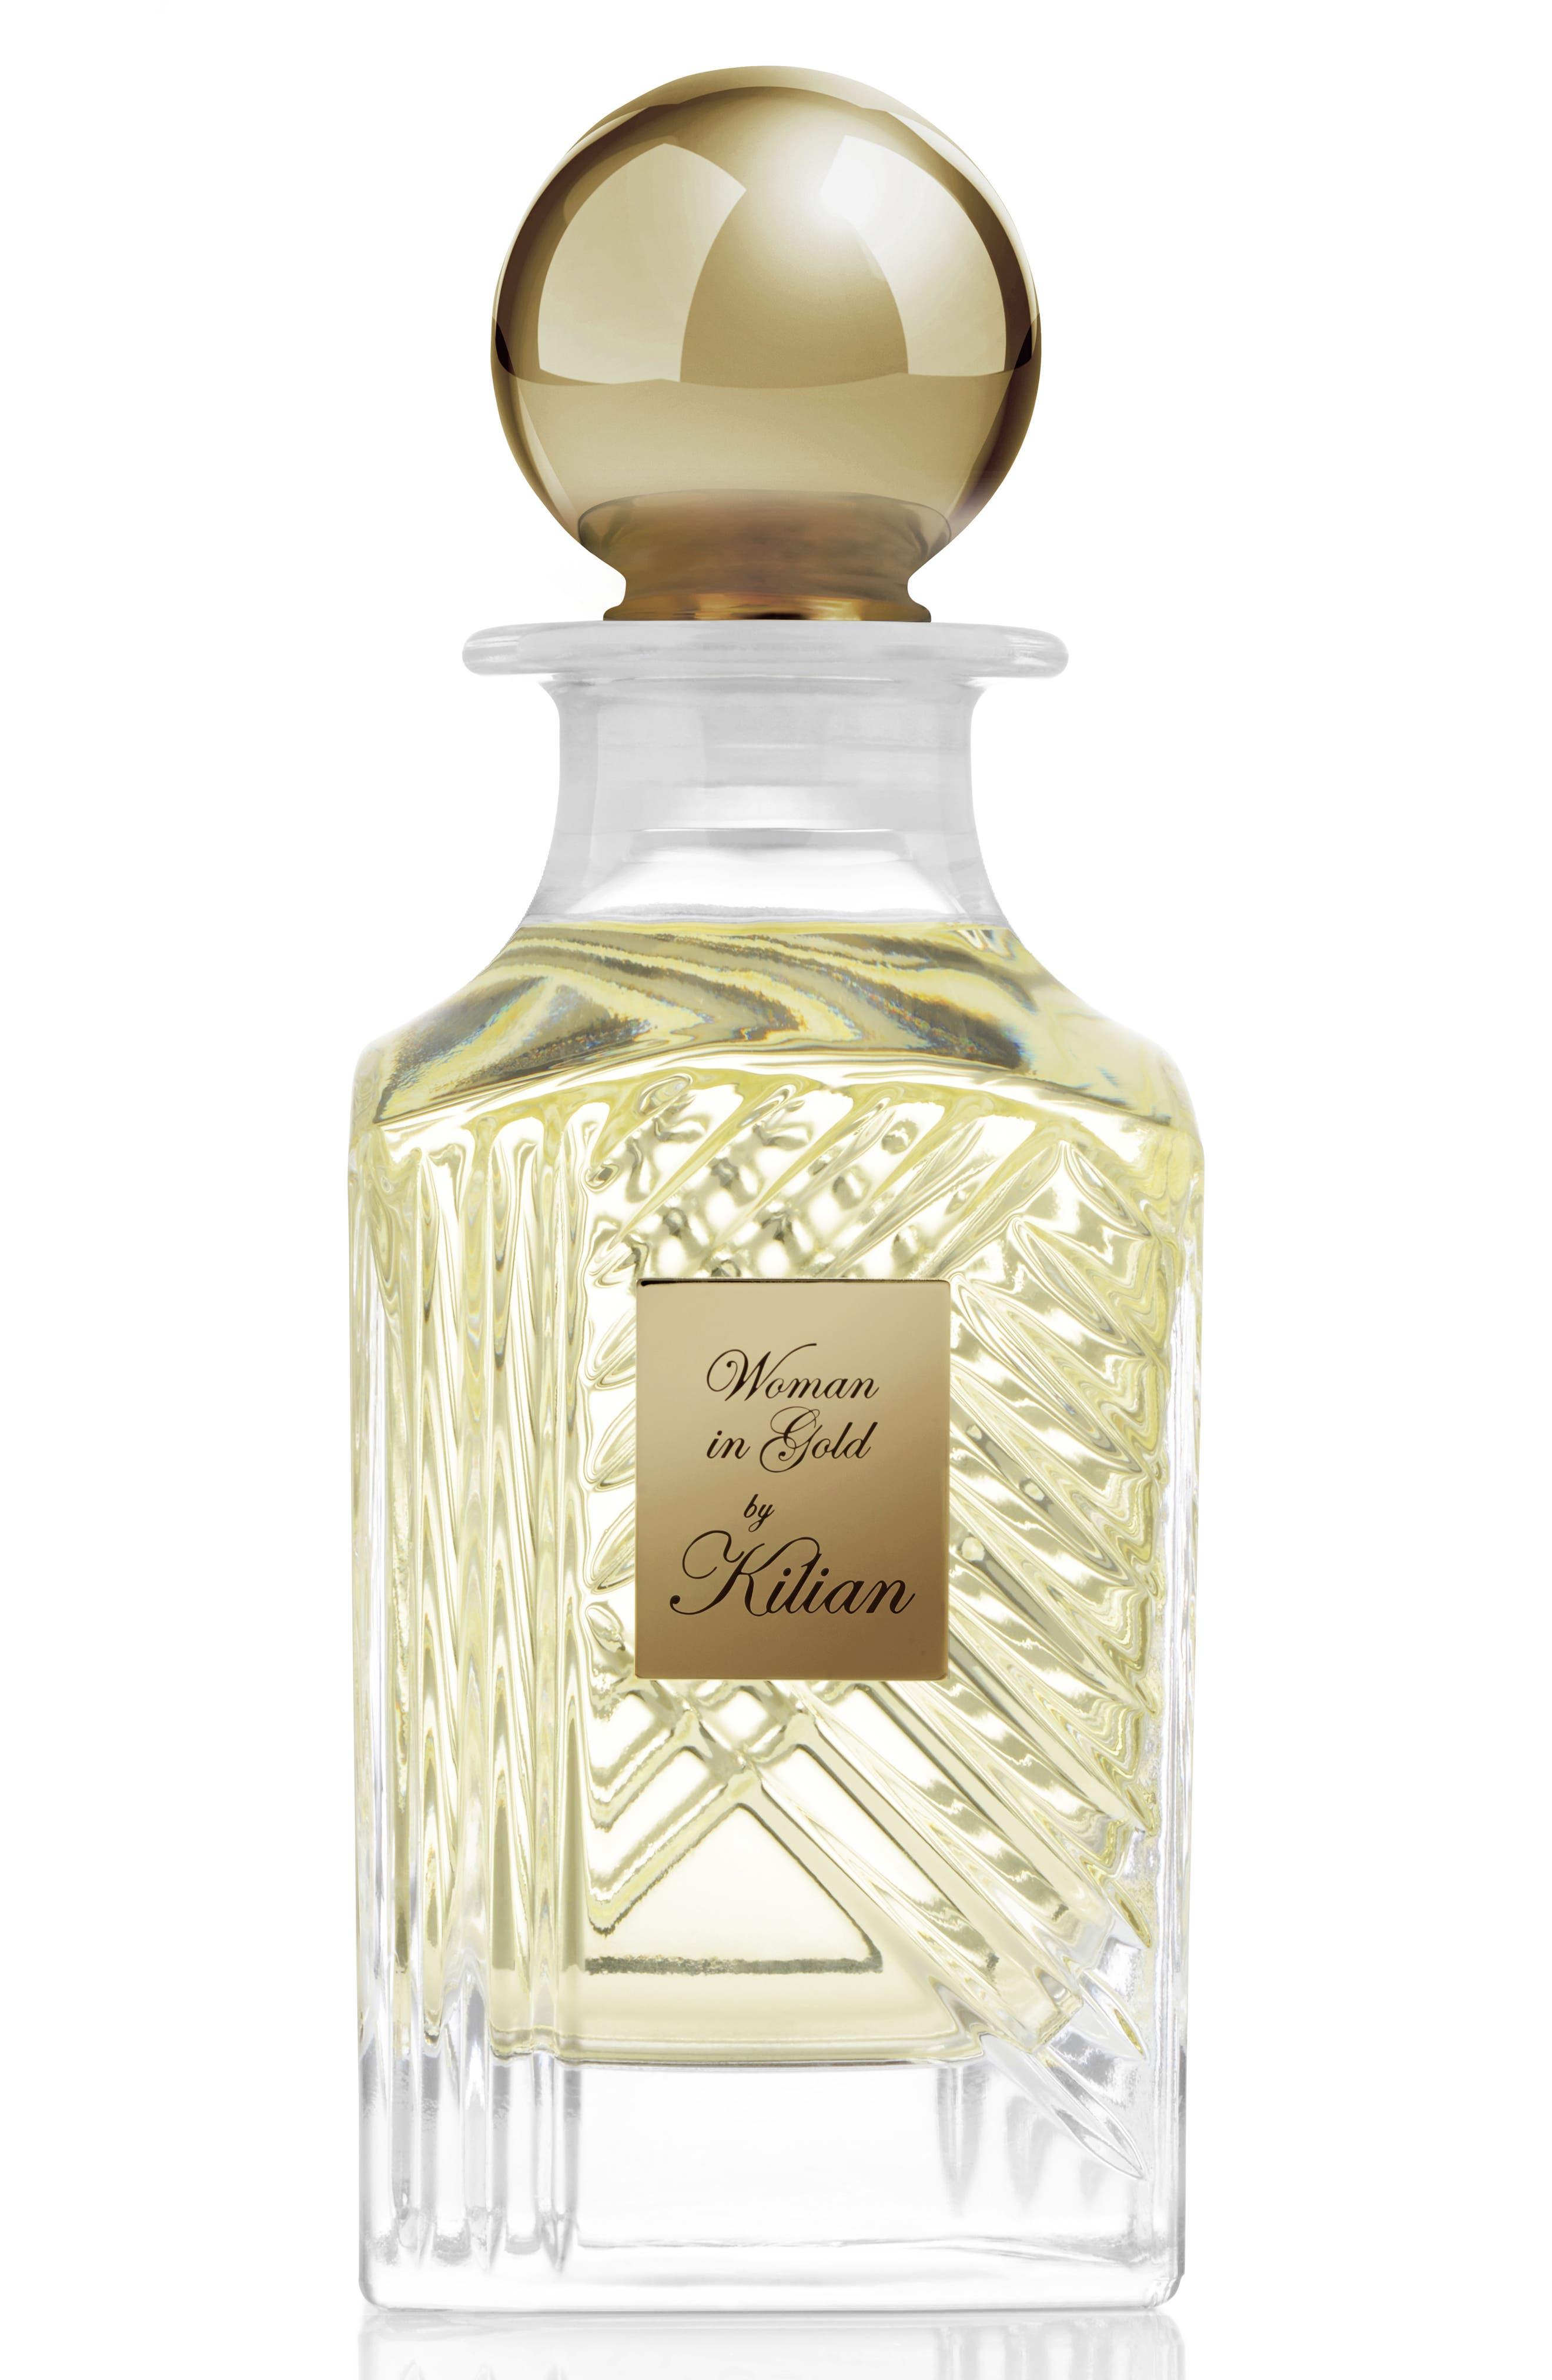 Main Image - Kilian Woman in Gold Collector's Edition Mini Carafe Perfume